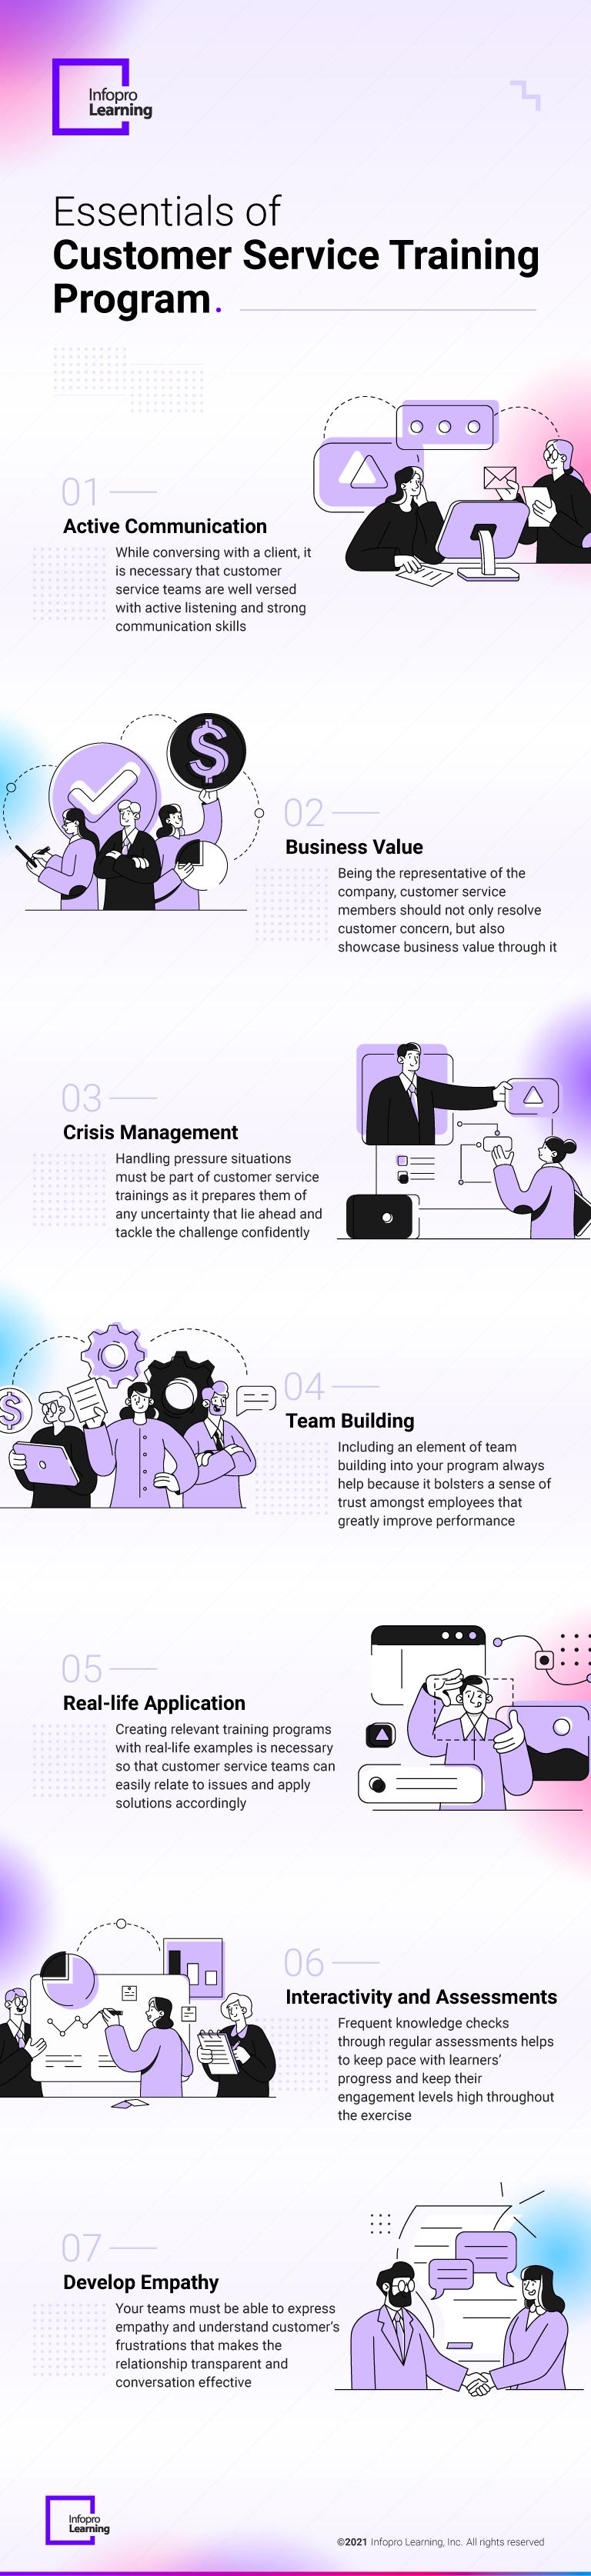 Essentials of Customer Service Training Program